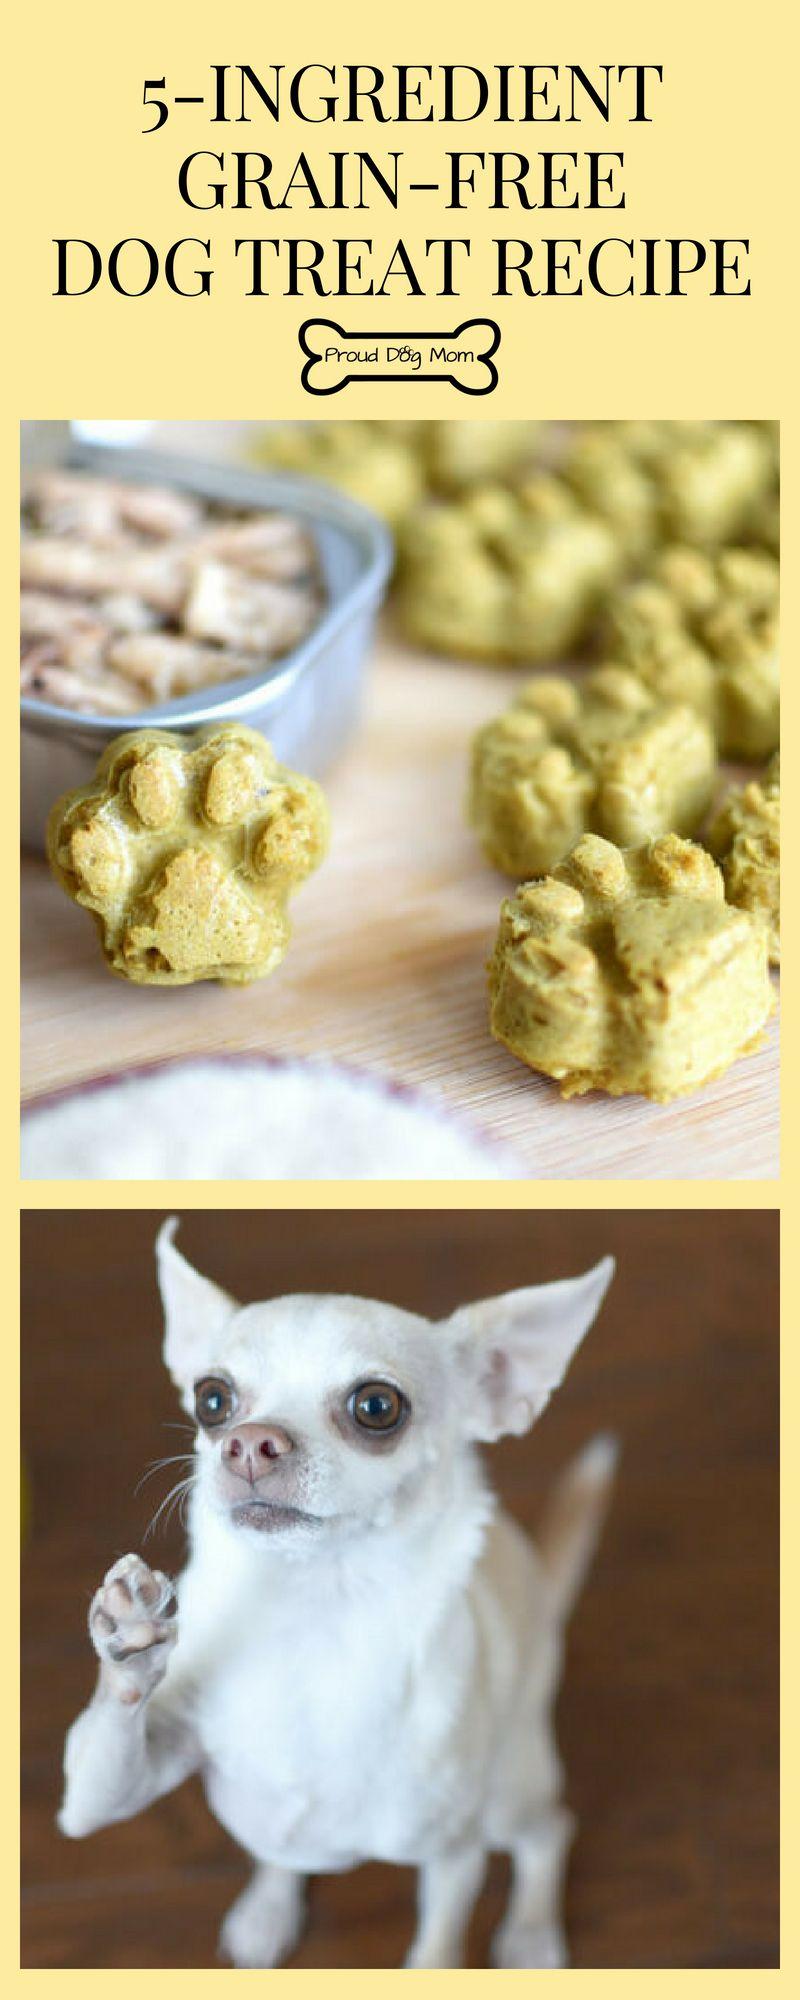 Fish Paws Dog Treat Recipe Diy Dog Treats Dog Treats Grain